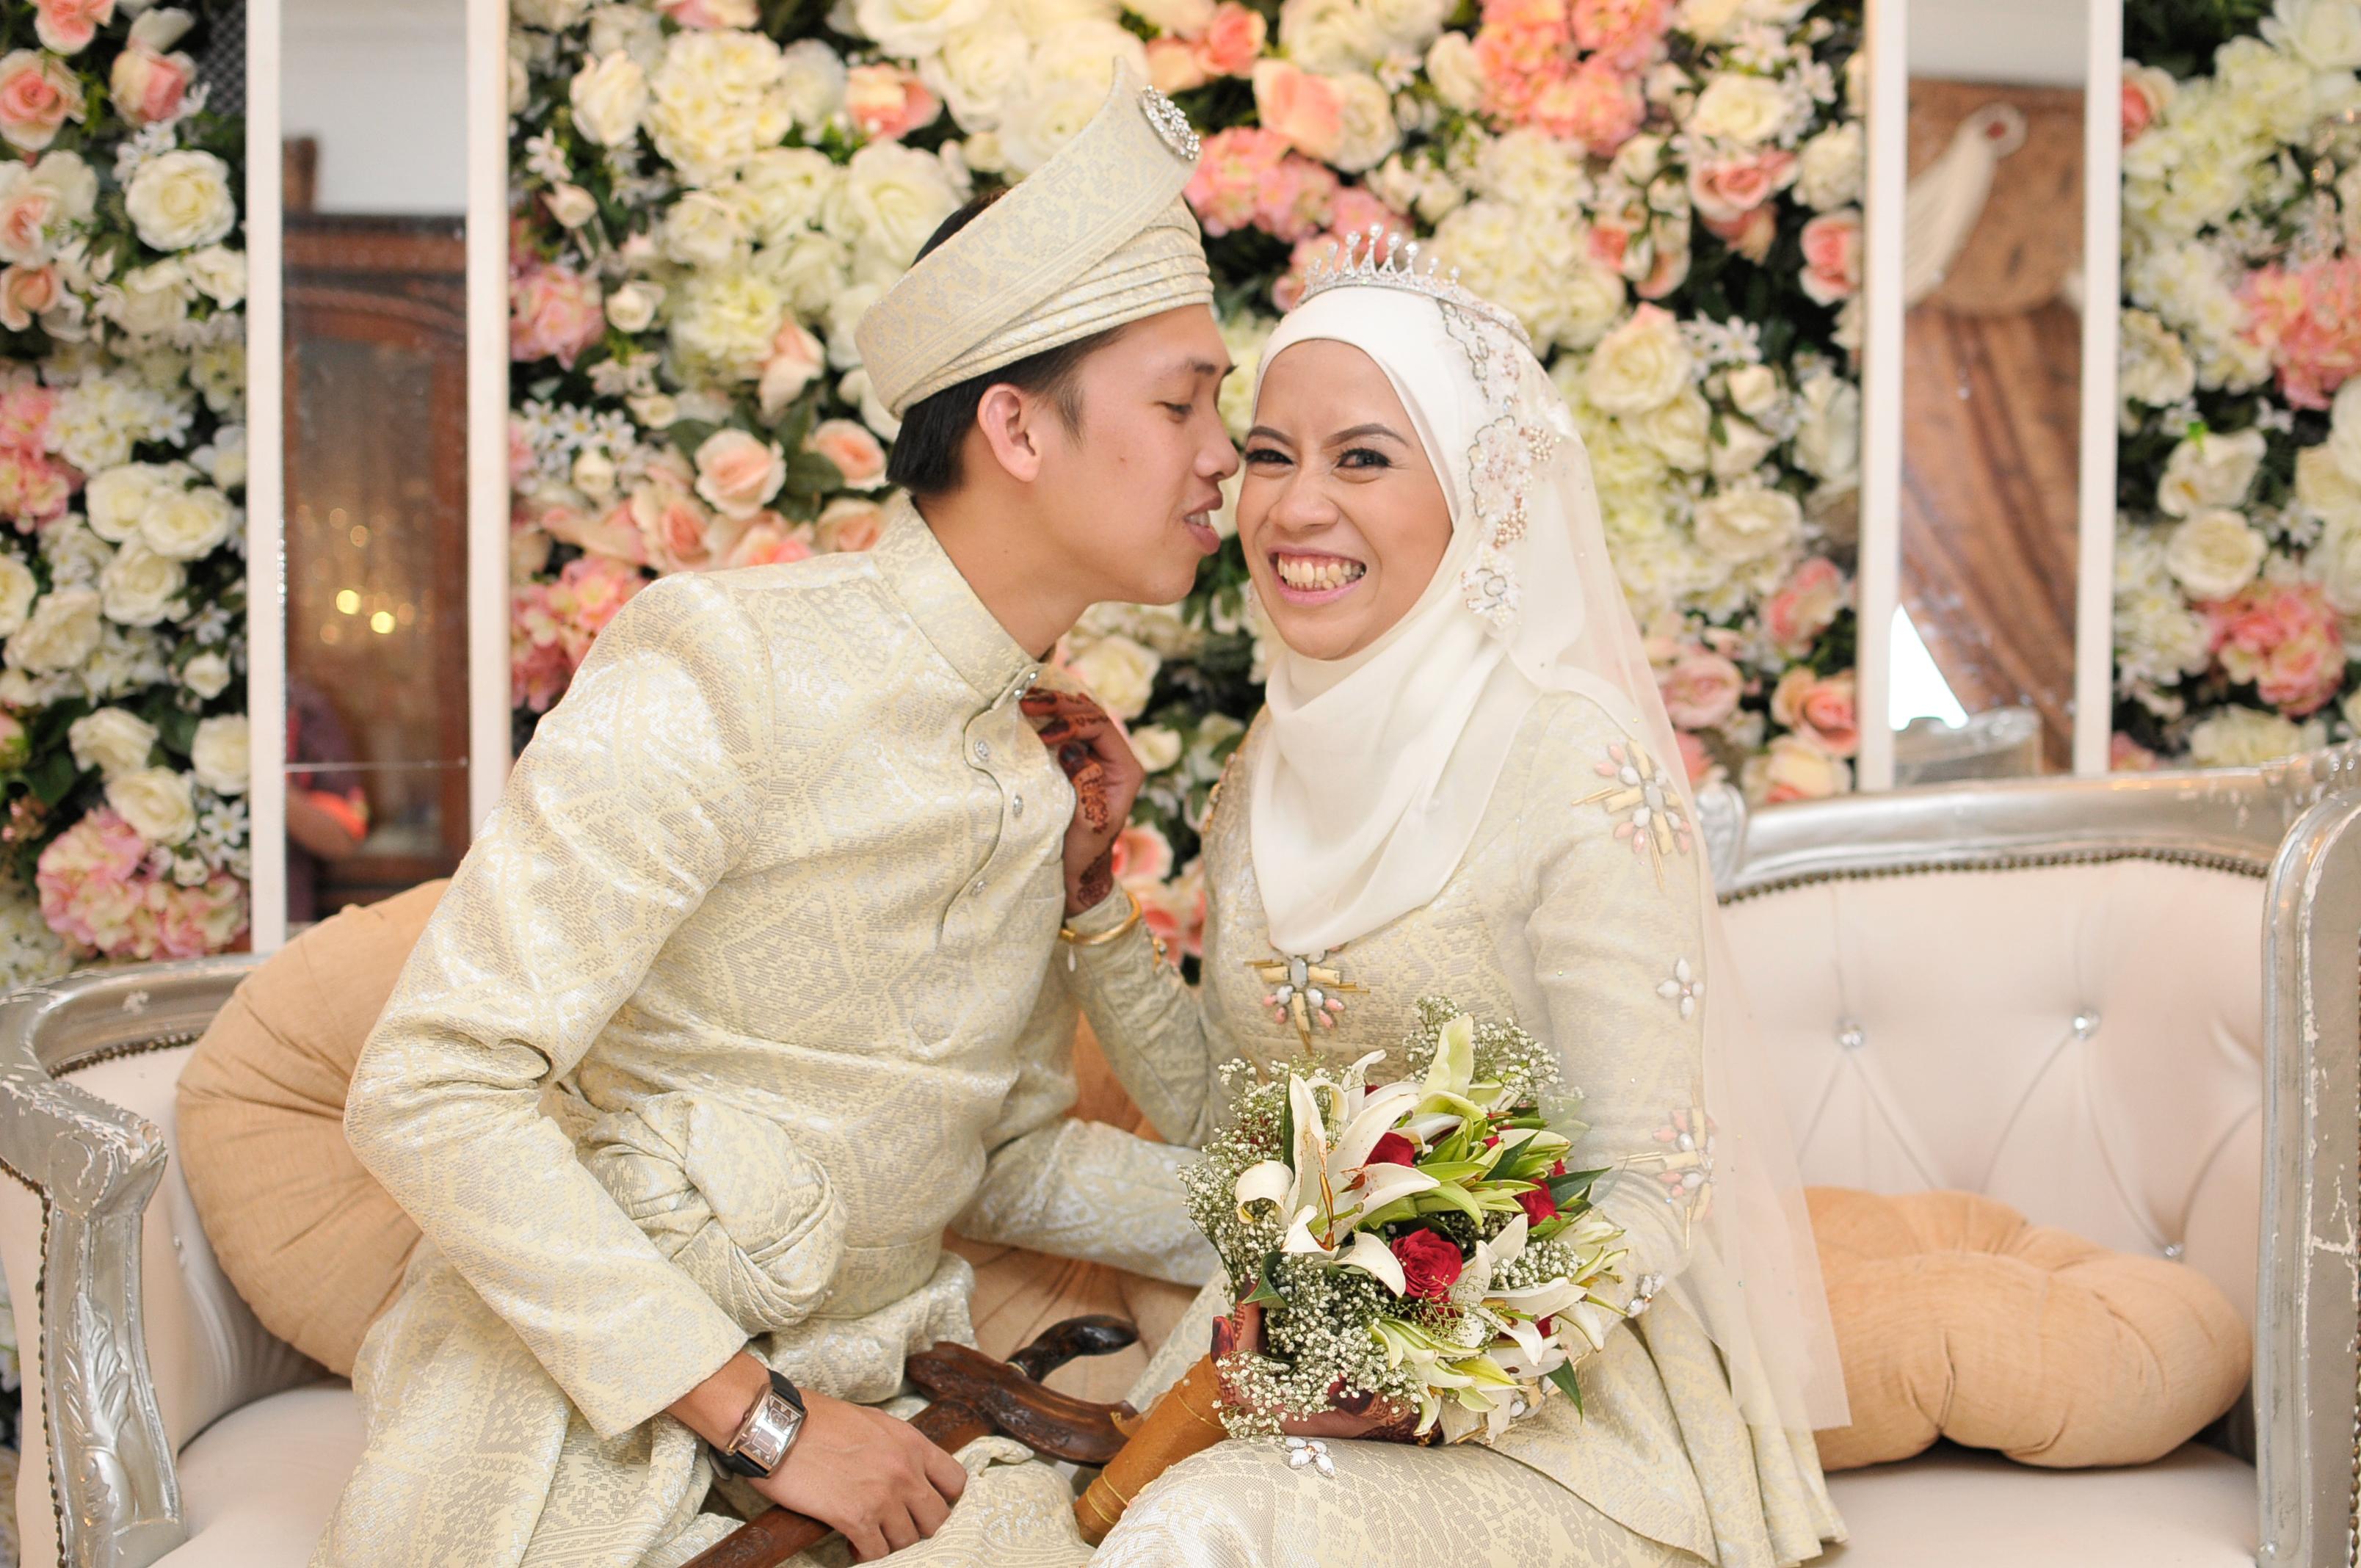 7 Sebab Kenapa Isteri Hilang Rasa Cinta Pada Suami, Soal Tak Hiraukan Anak Paling Buat Isteri Fed up!